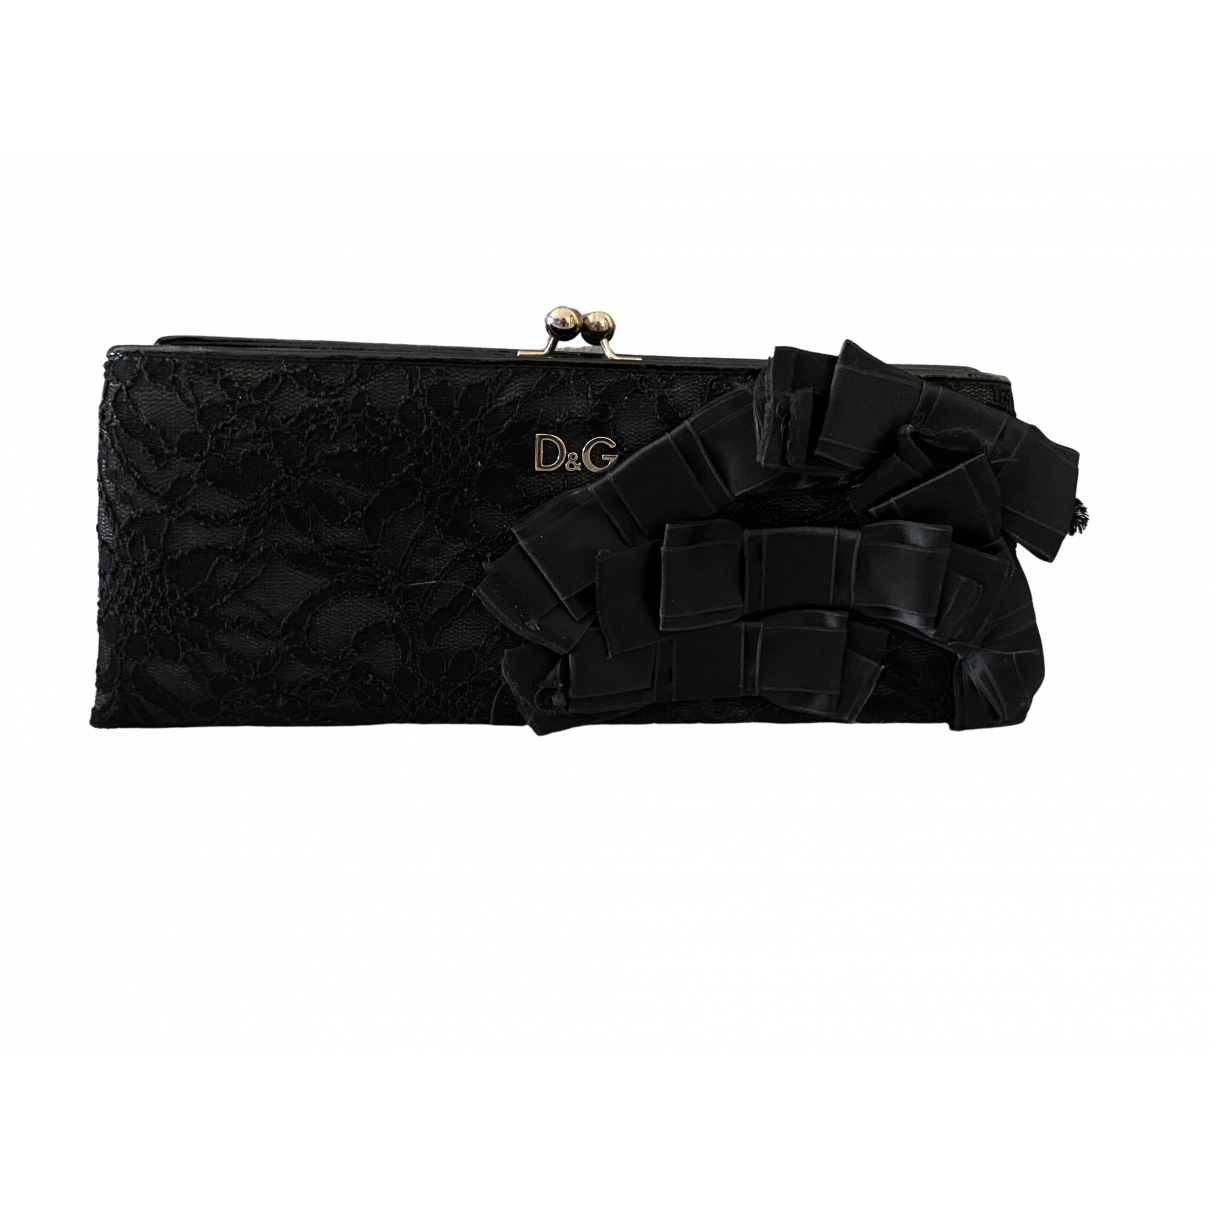 D&g \N Black Leather Clutch bag for Women \N